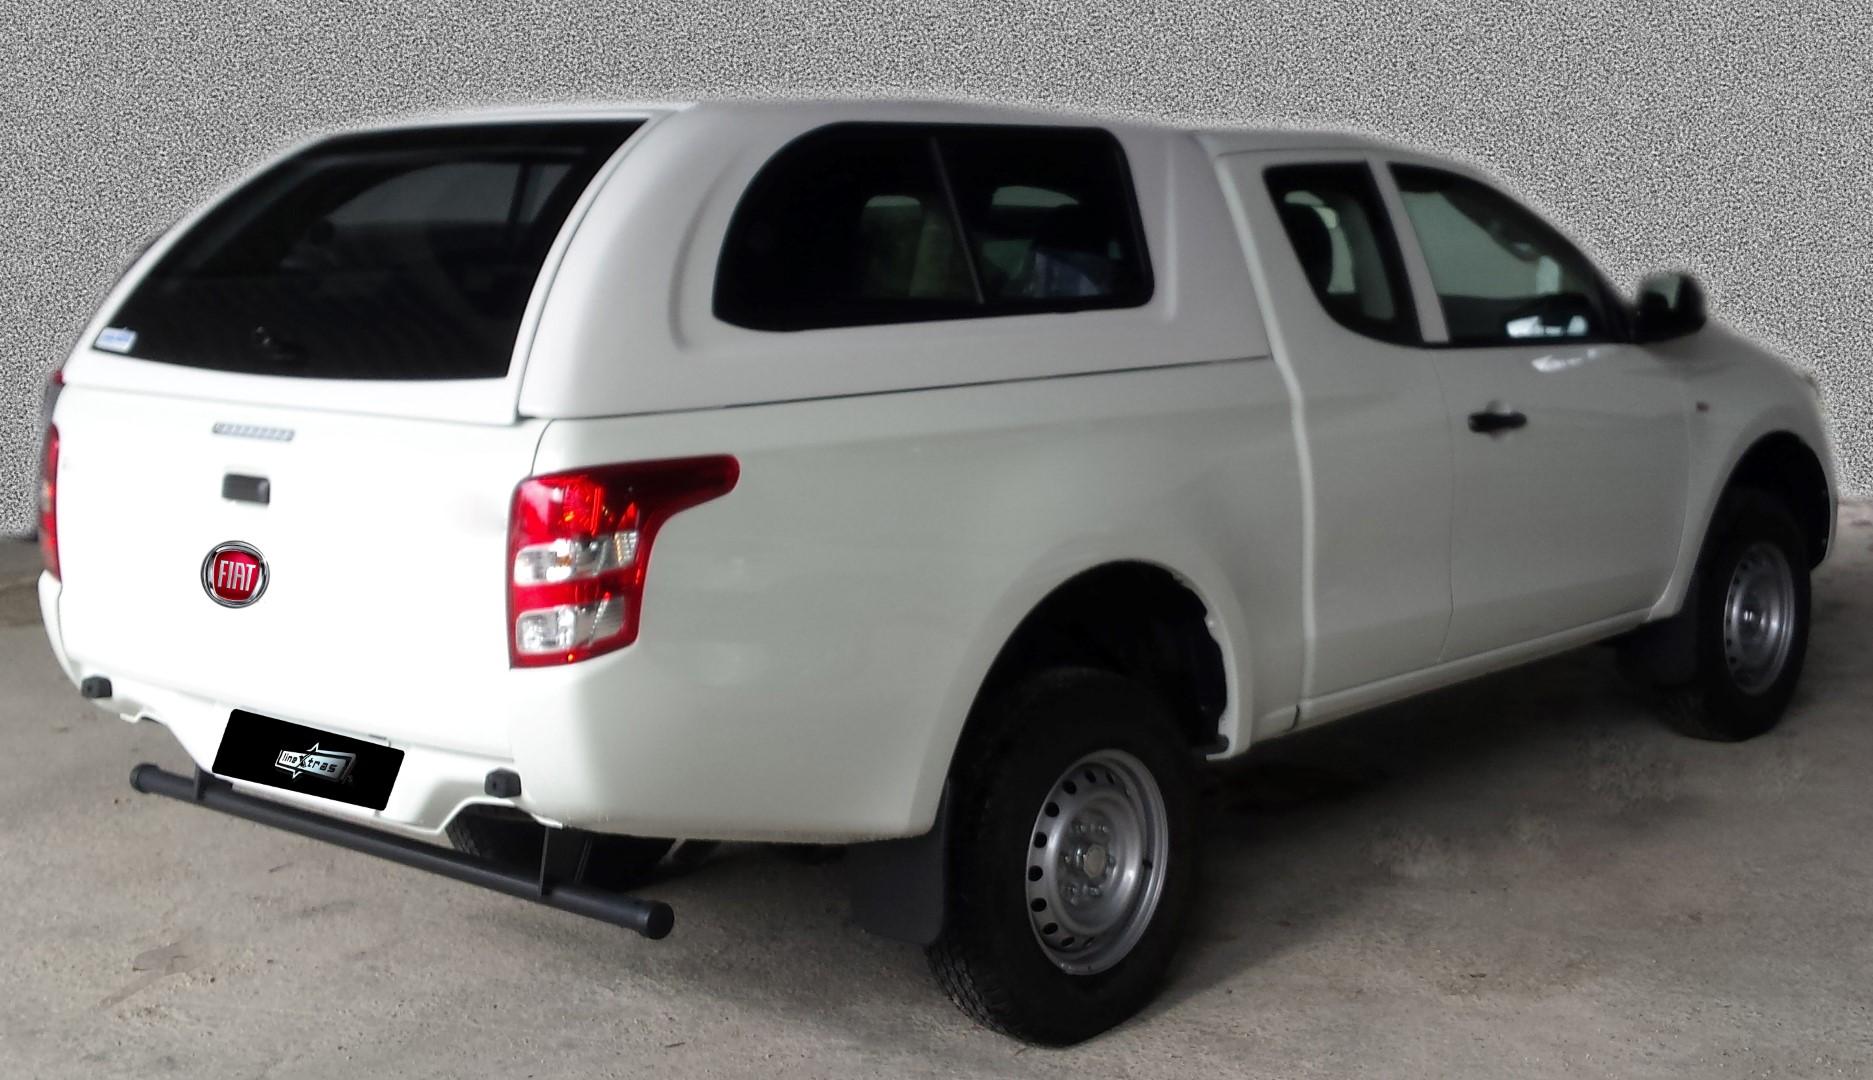 STAR-LUX – FIAT FULLBACK 2016 – extra cabina